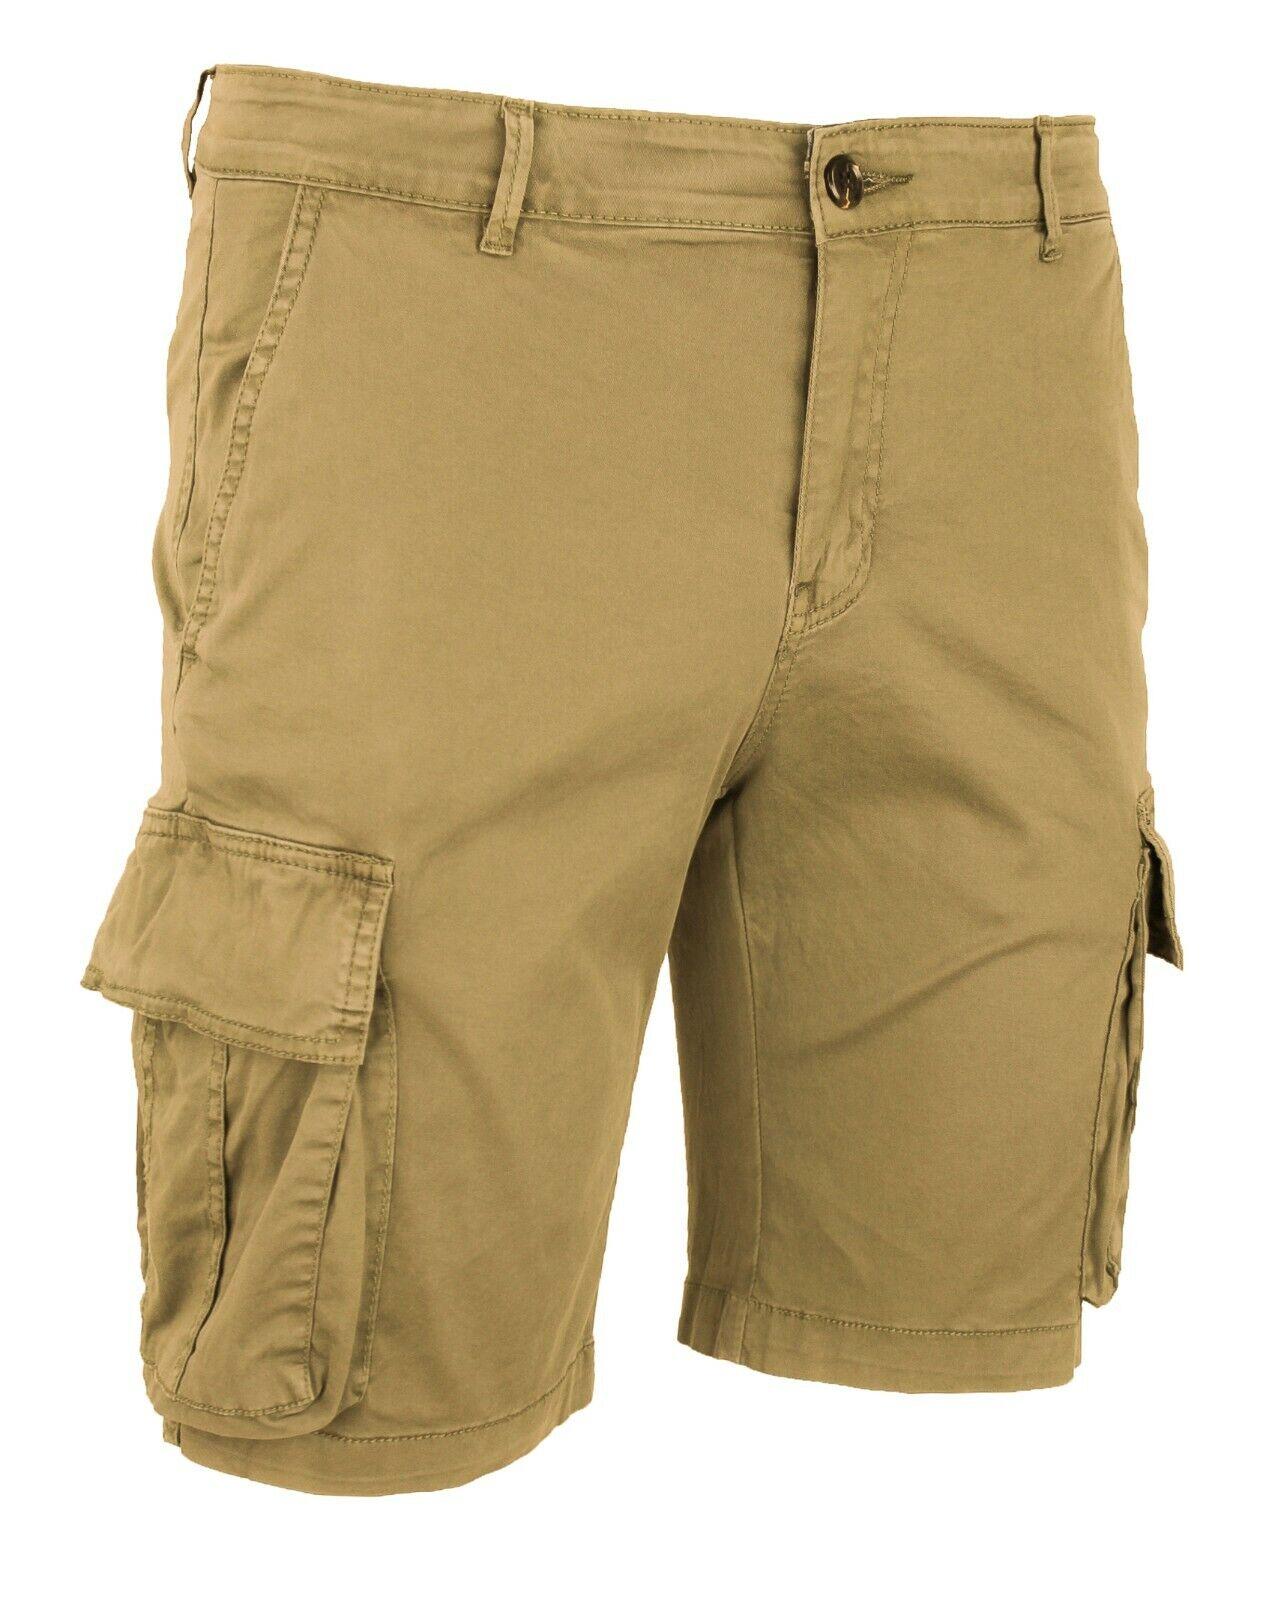 Evoga Pantaloni Corti Uomo Casual Basic Shorts Jeans Bermuda Slim Fit